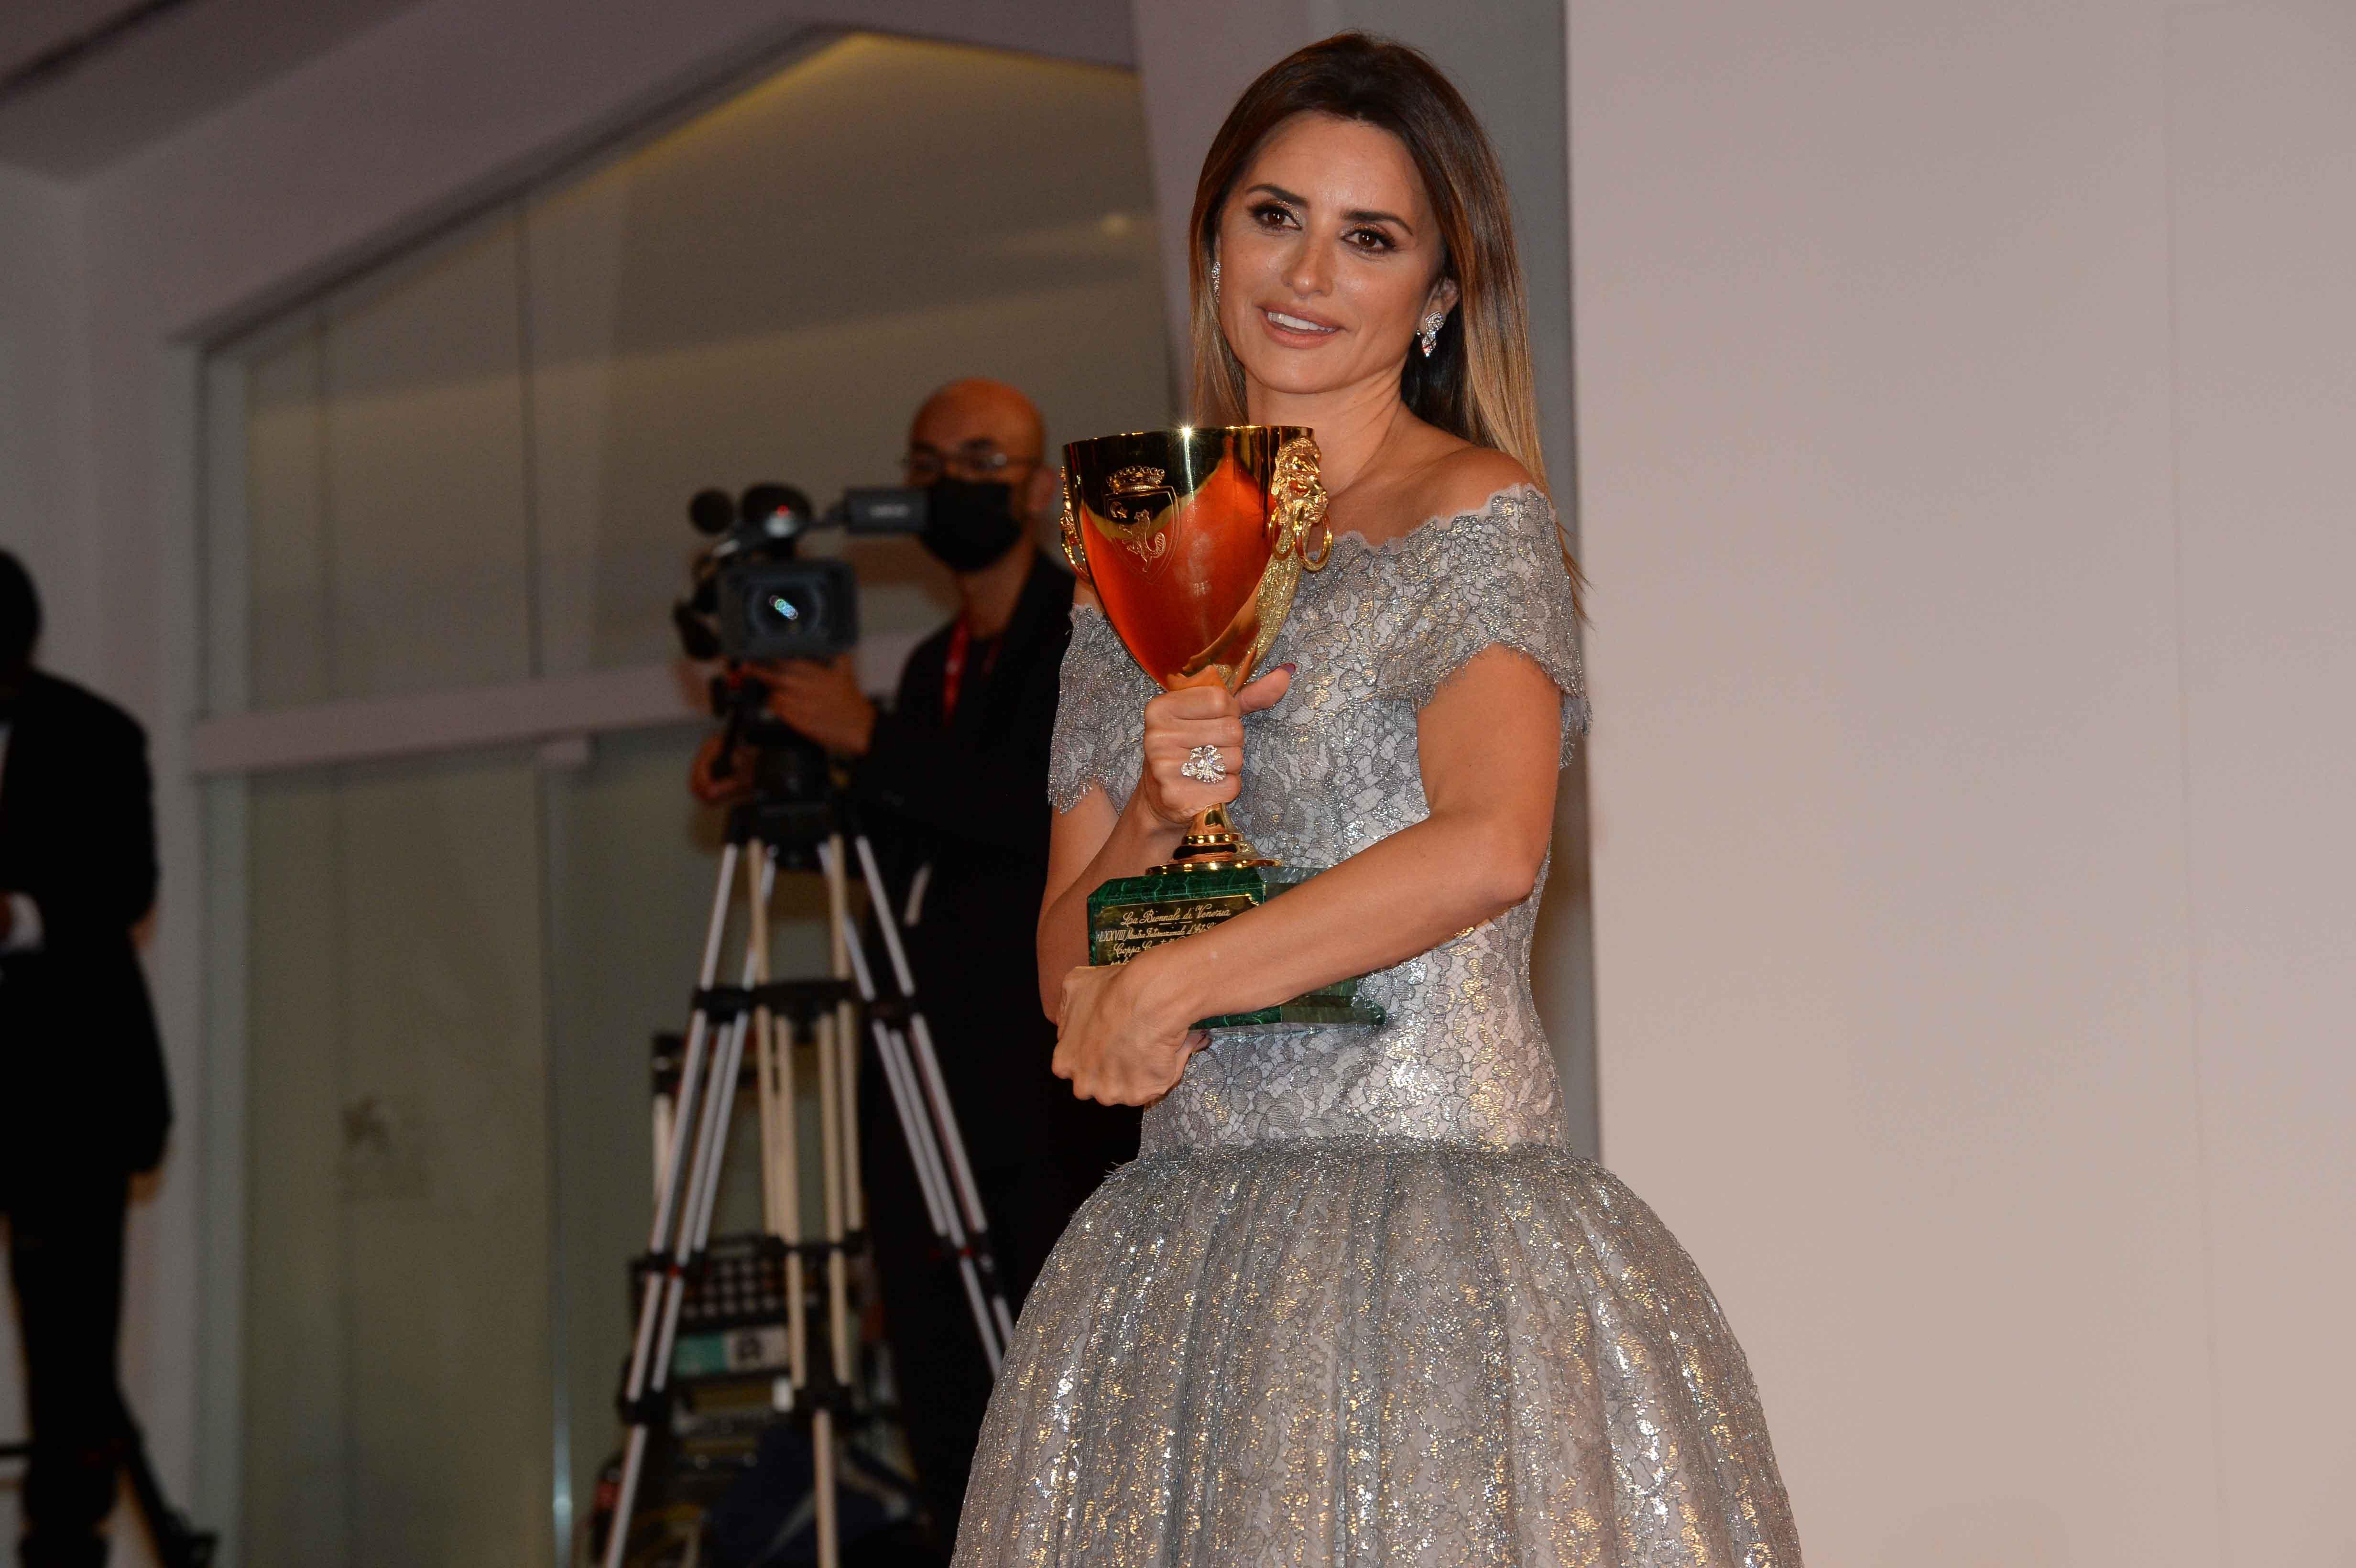 Coppa Volpi miglior interpretazione femminile a Penélope Cruz, Madres Paralelas